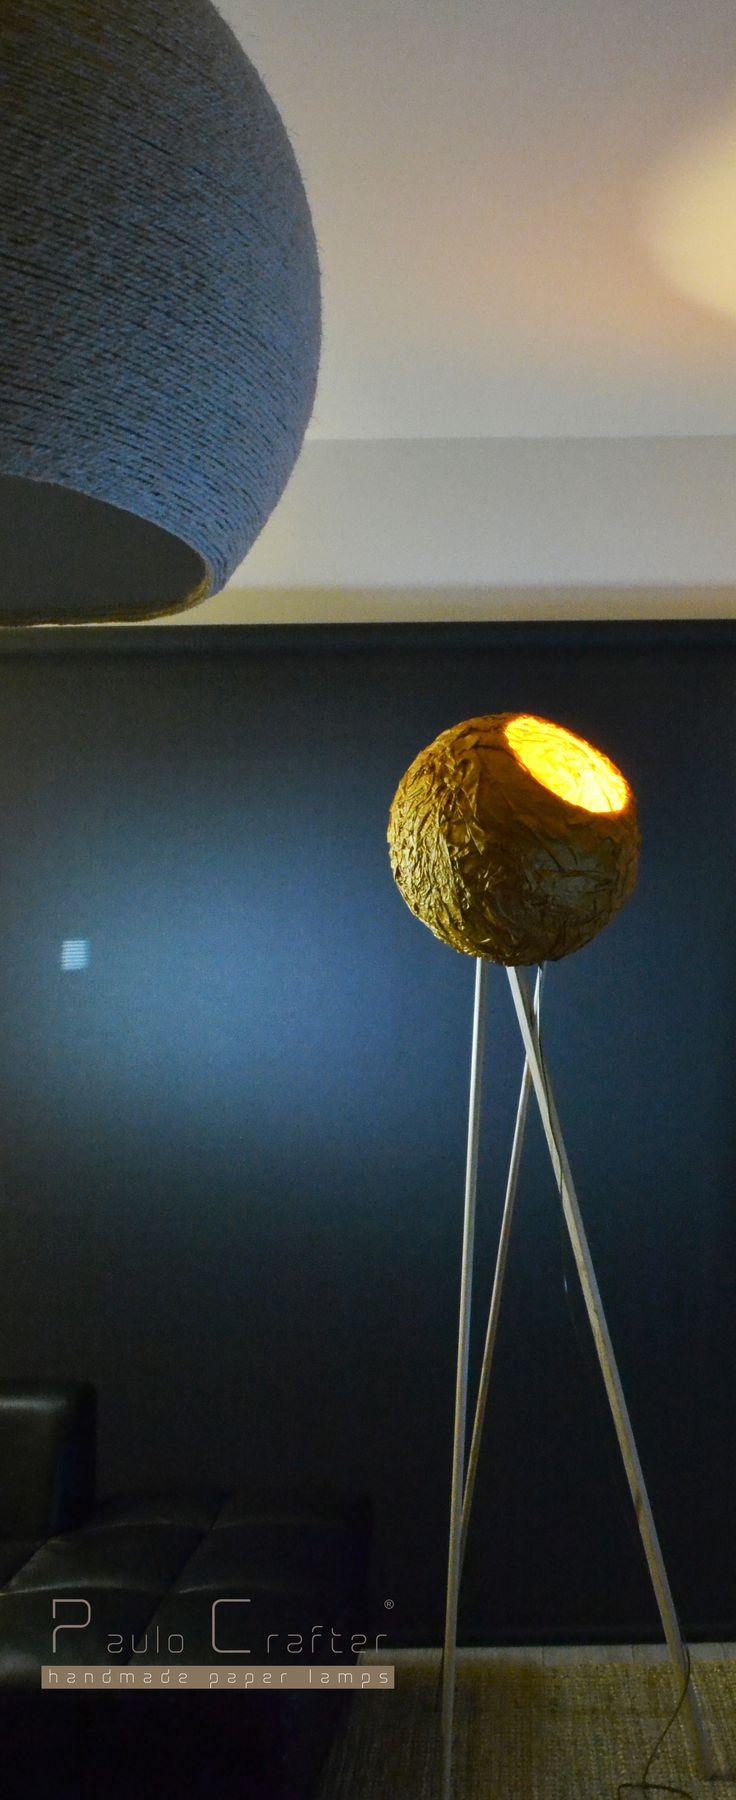 GoldenEYE. Handmade by Paulo Crafter